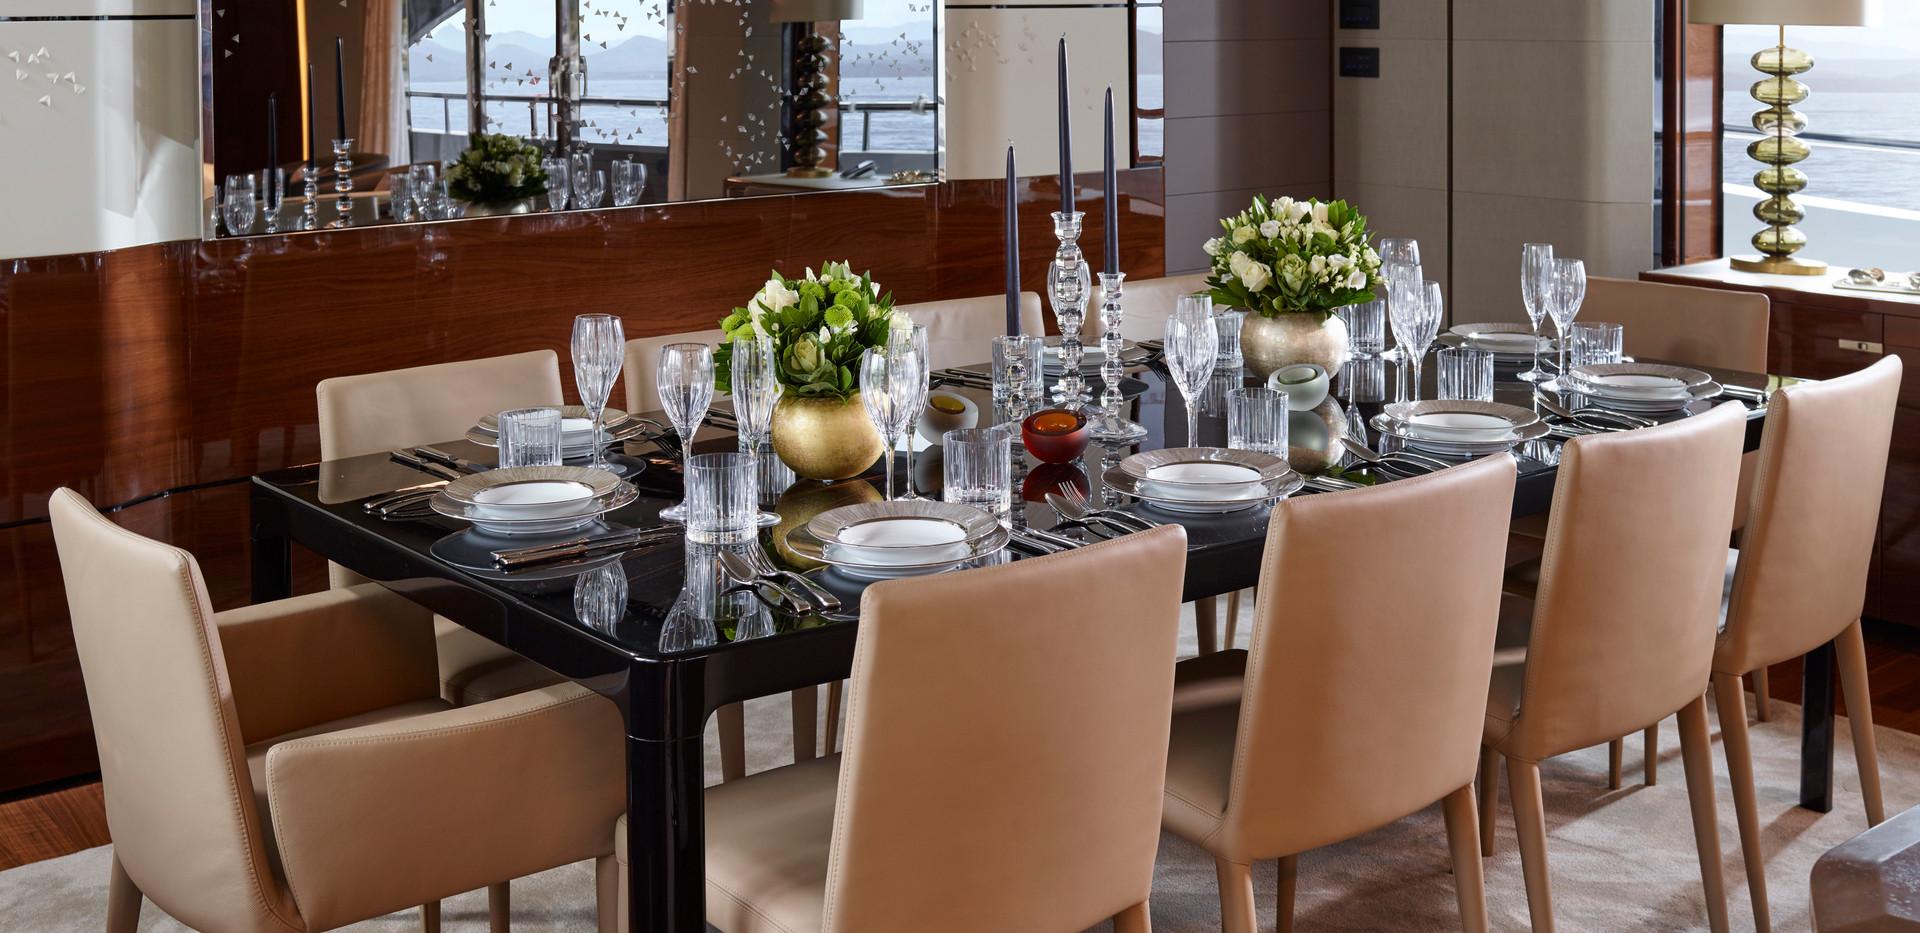 35m-interior-dining-area-day-american-wa